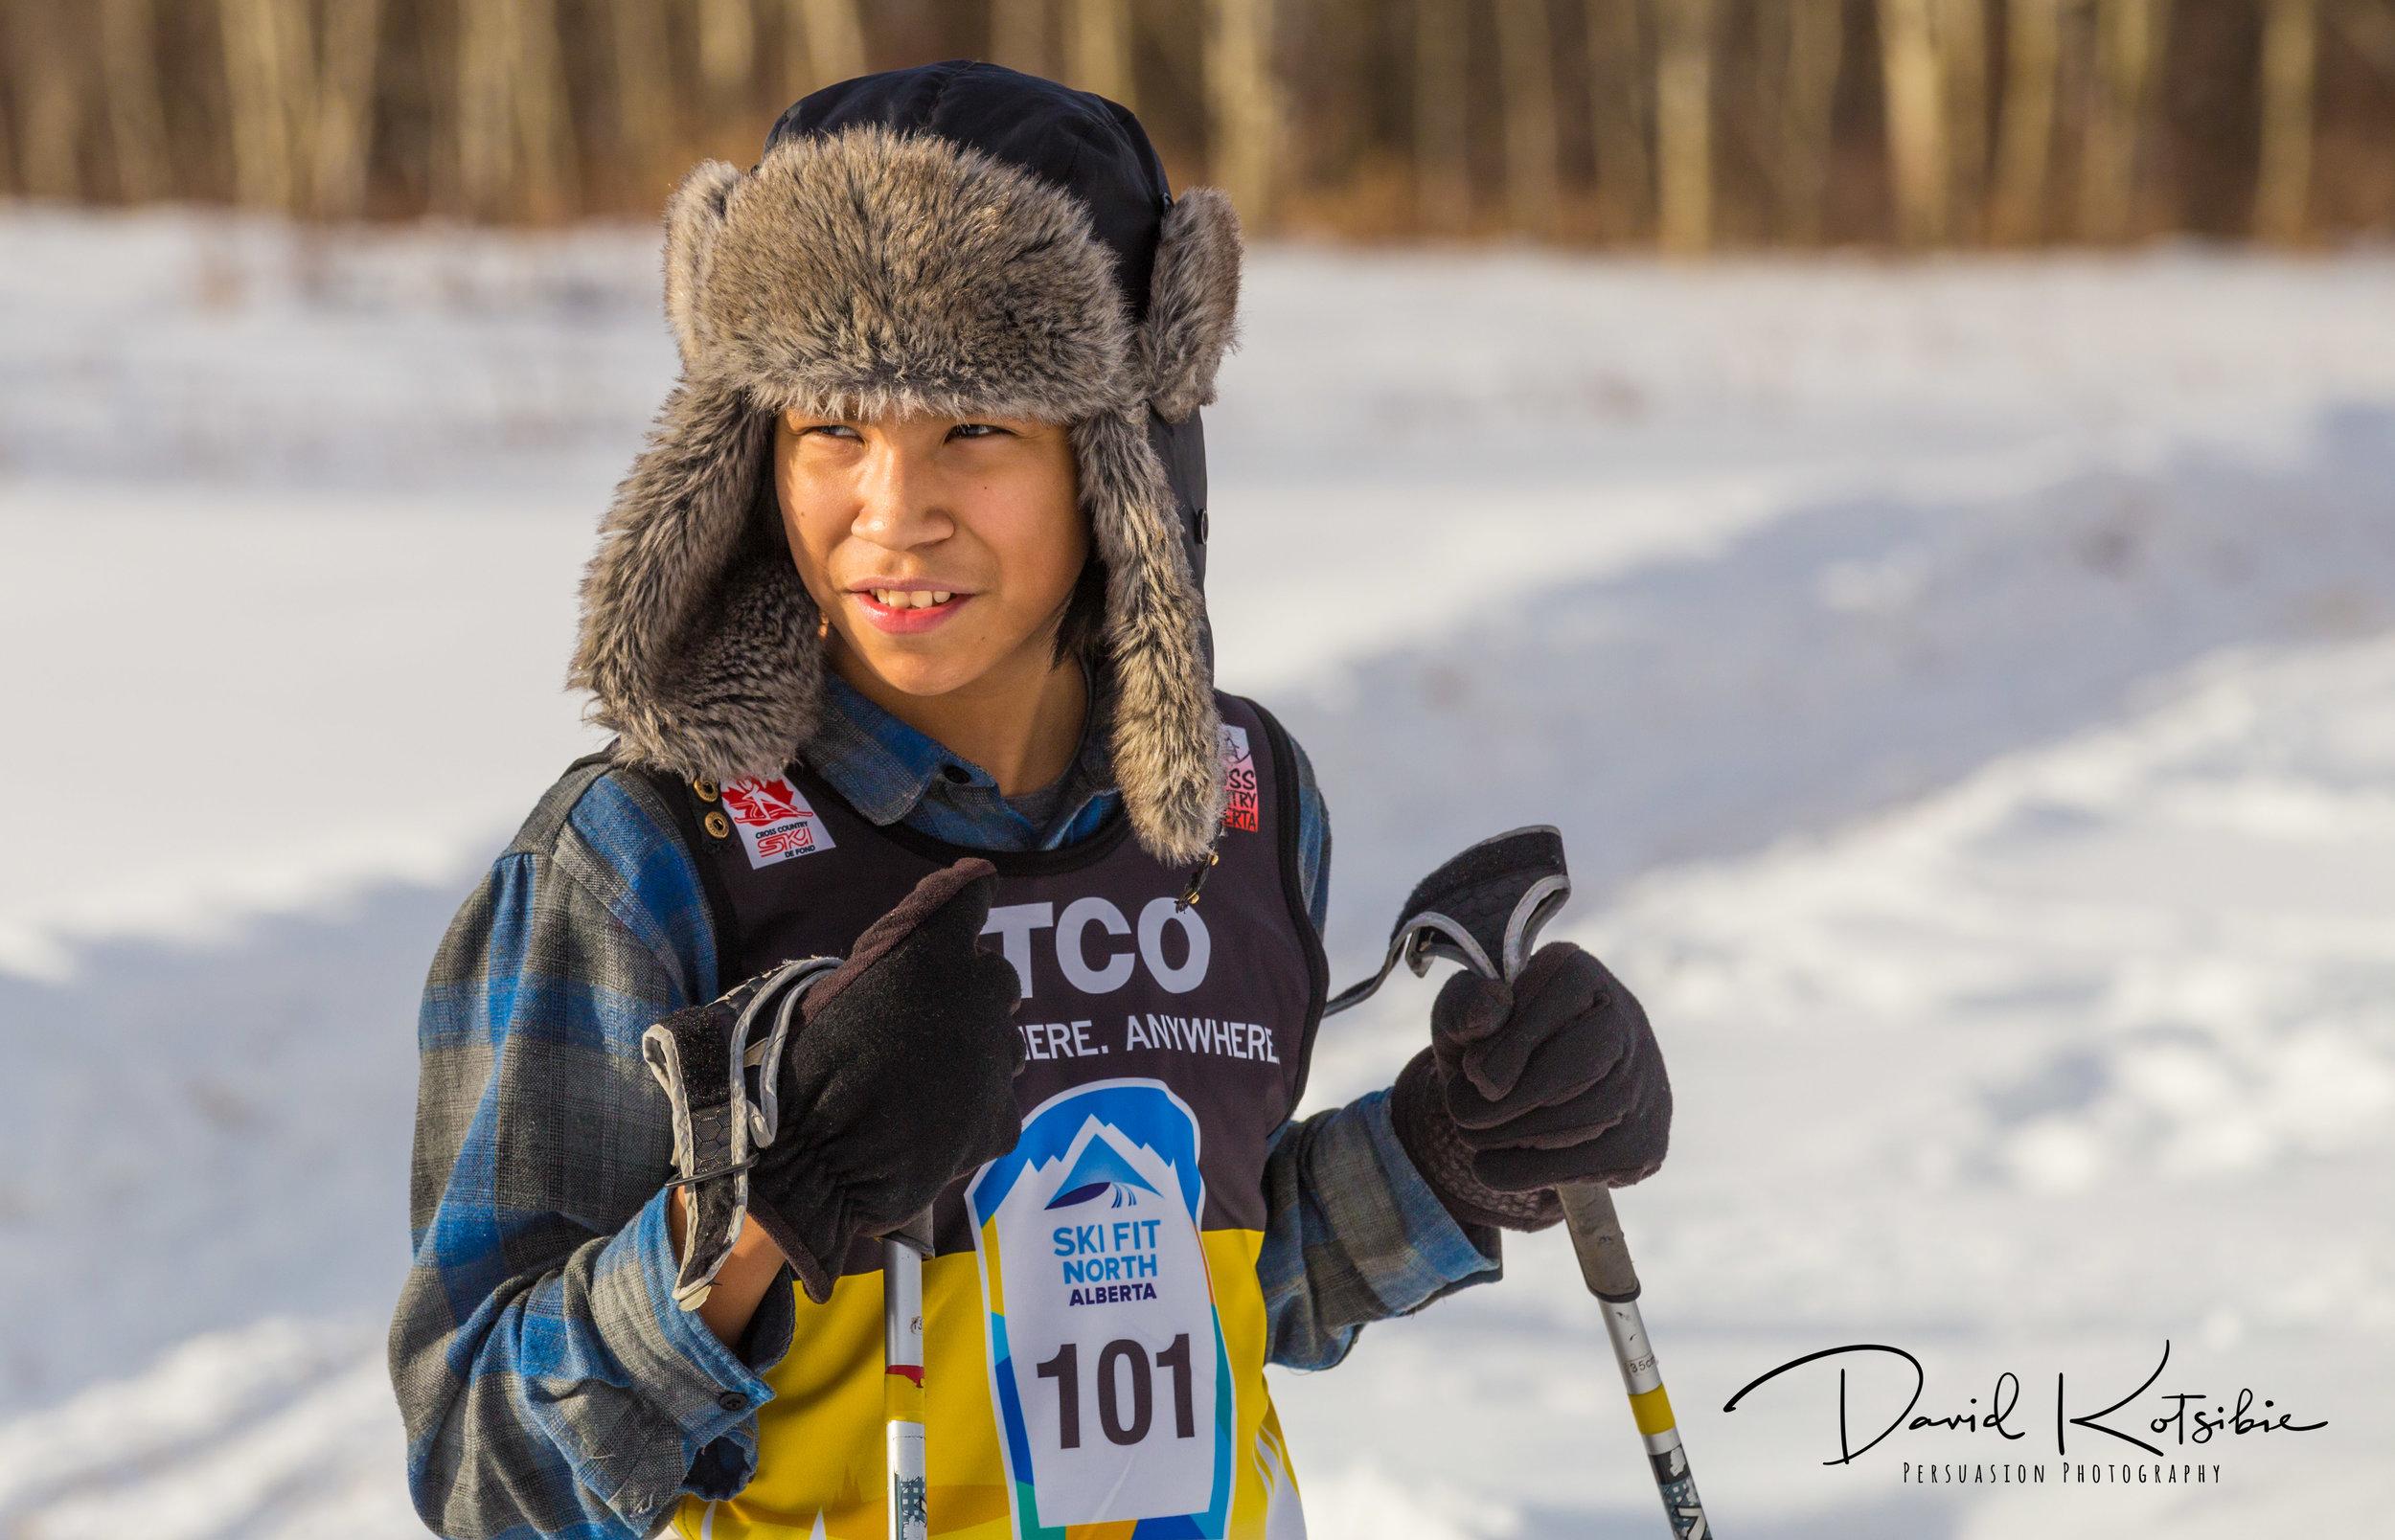 Ski Fit North Alberta @ Tsuu T'ina Nation